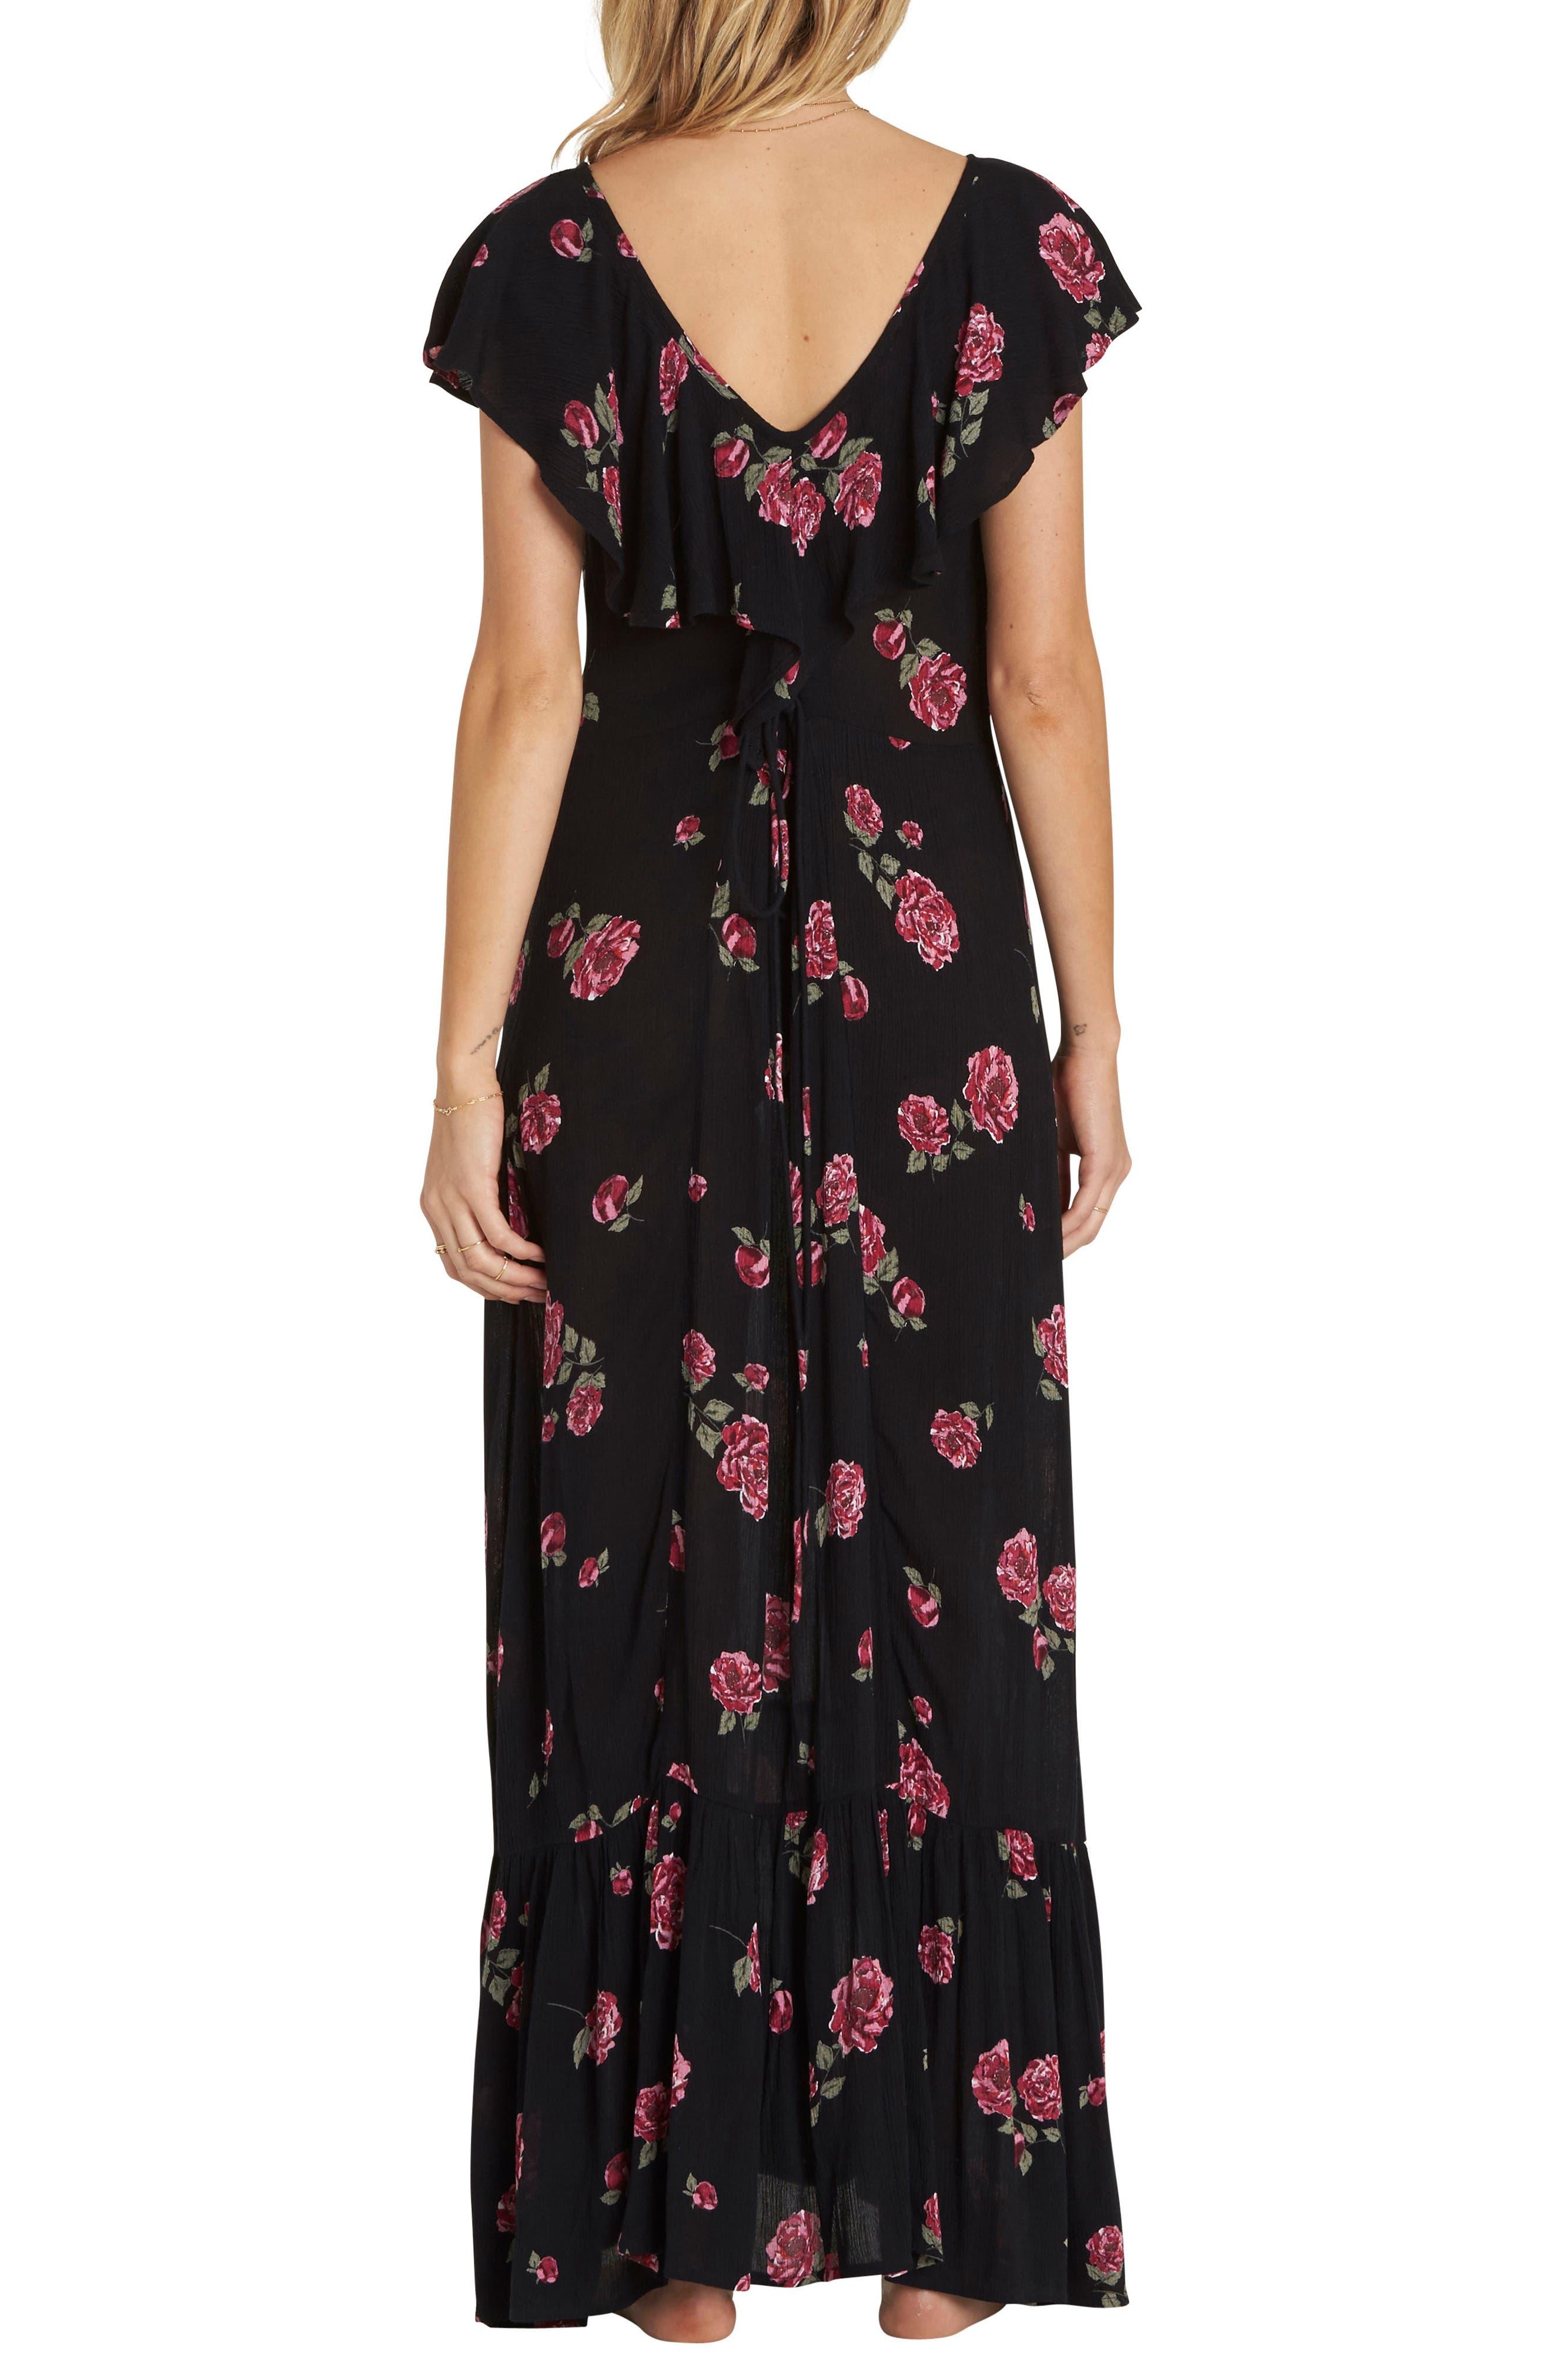 Southern Border Ruffled Maxi Dress,                             Alternate thumbnail 2, color,                             Black